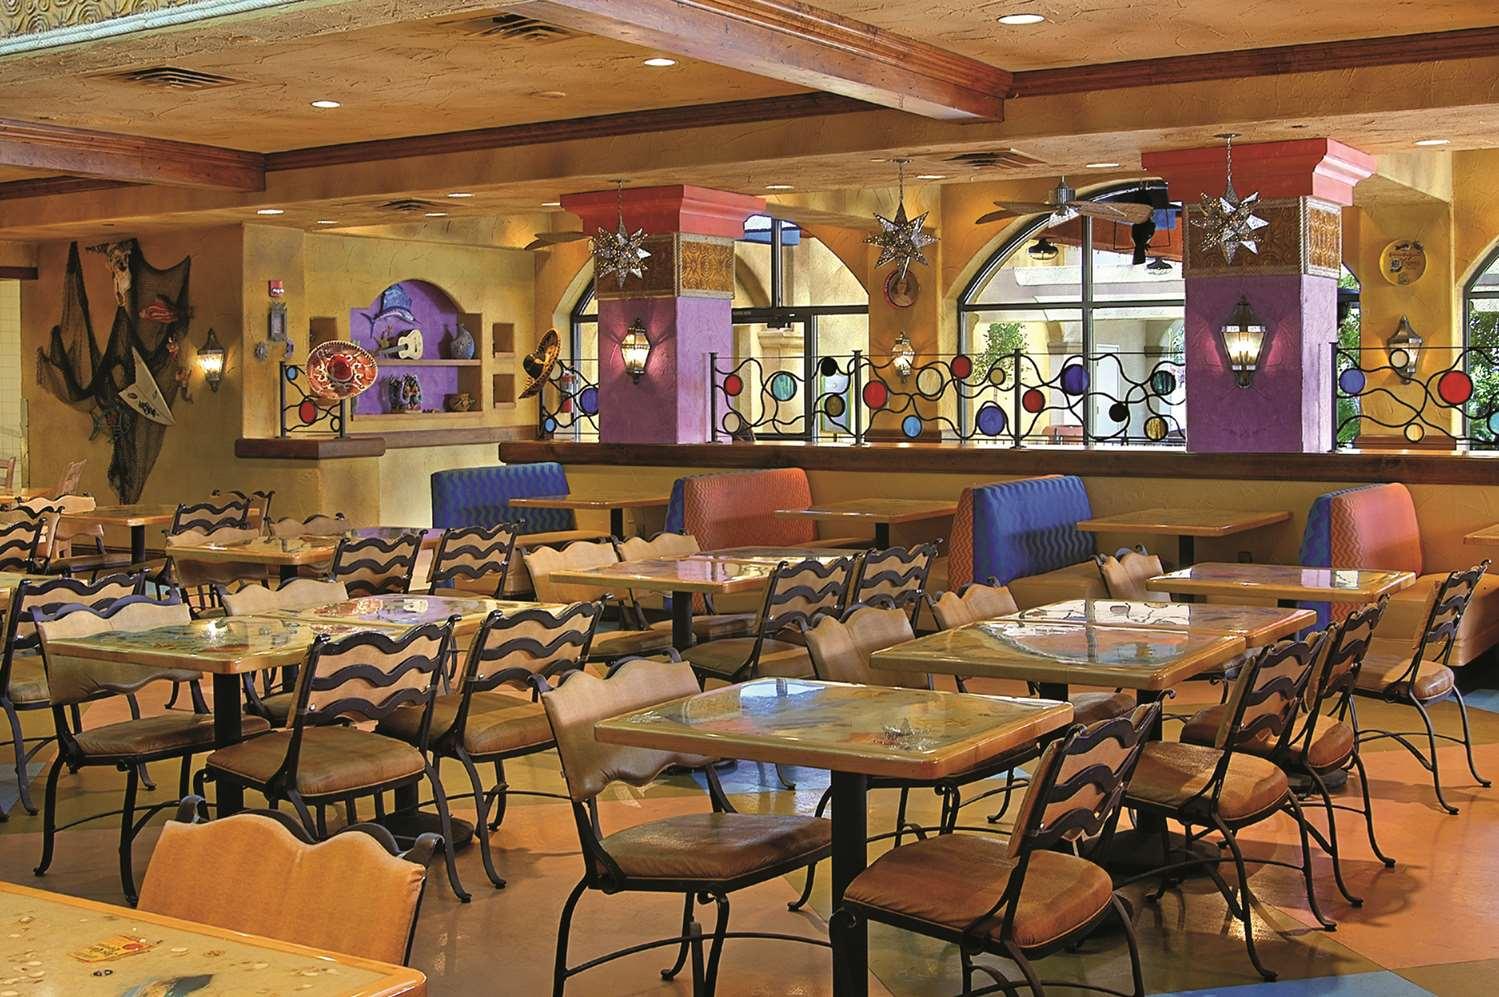 Restaurant - Harrah's Hotel Laughlin